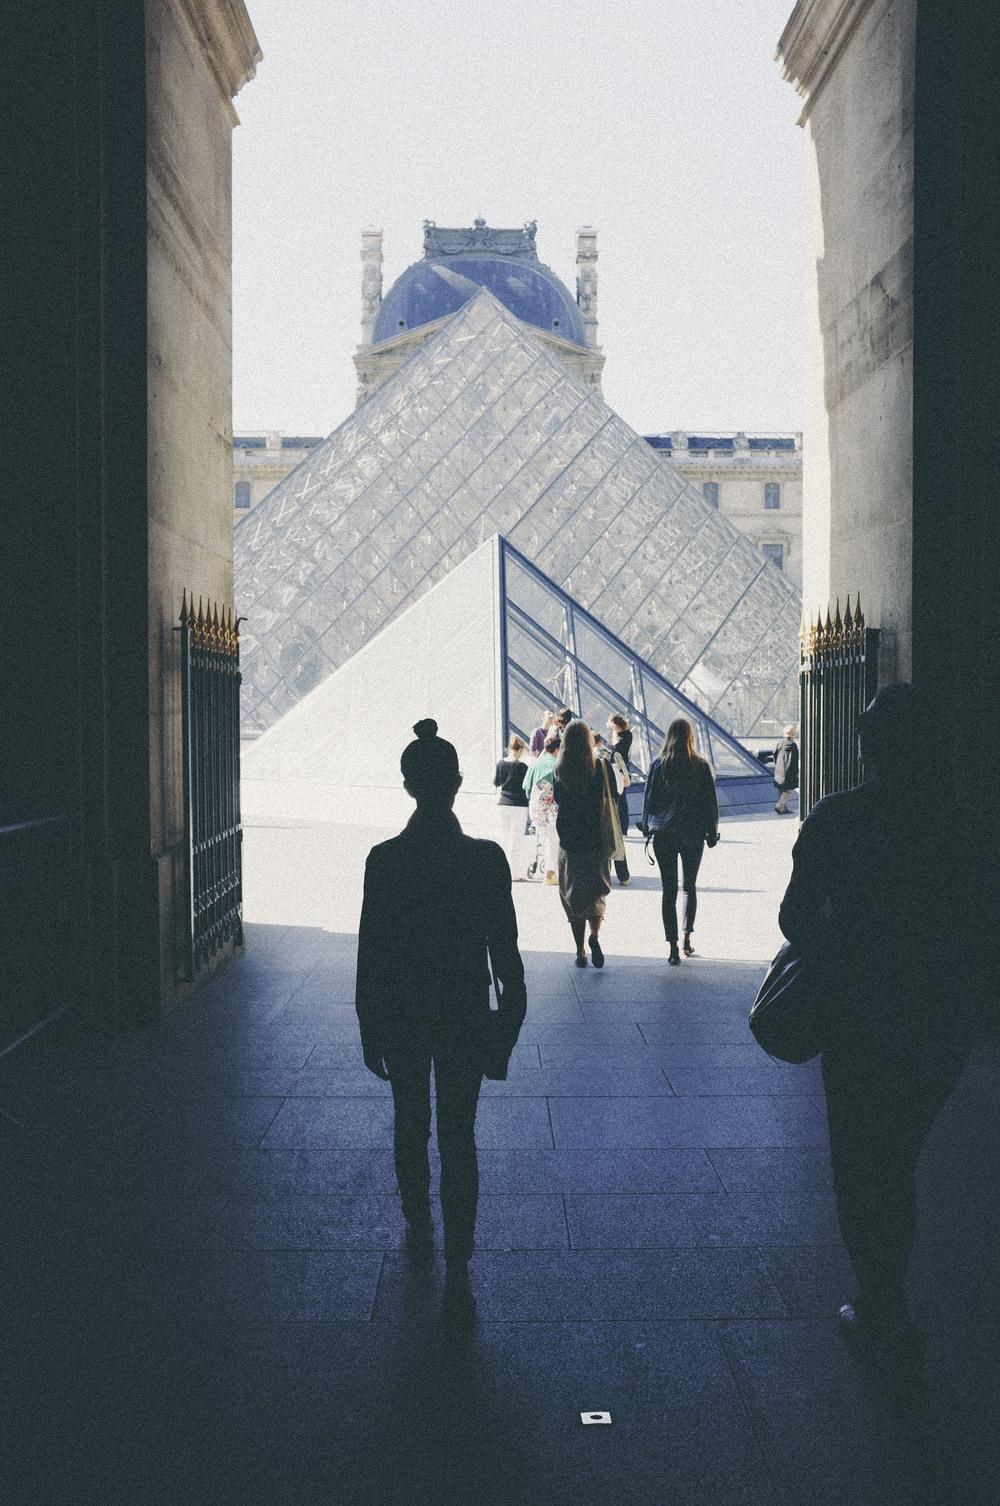 louvre pyramid, paris - www.derrive.com